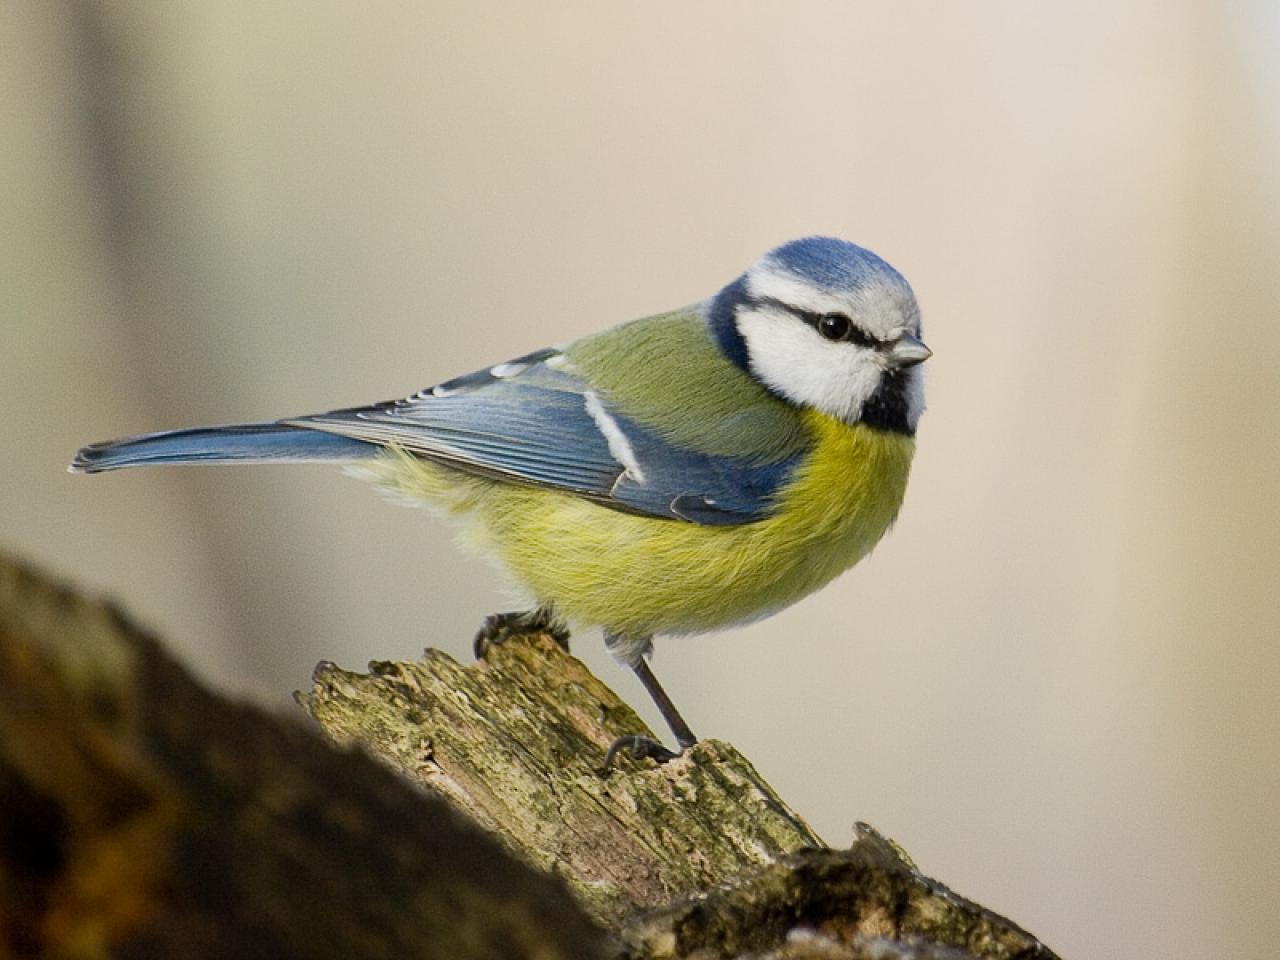 11mila uccelli morti in Germania, si teme malattia sconosciuta